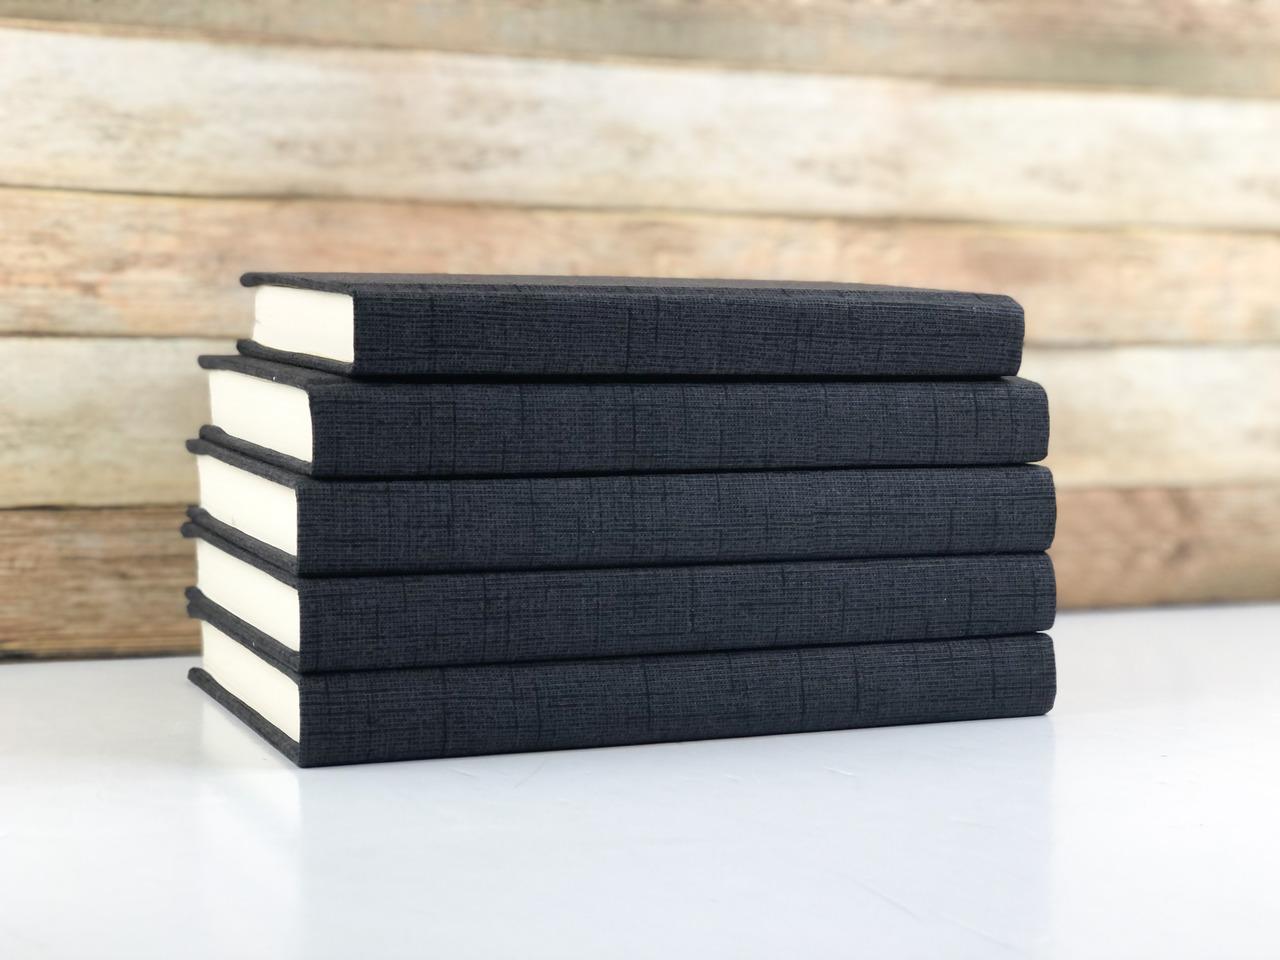 Set of 5 Decorative Books- Textured Black